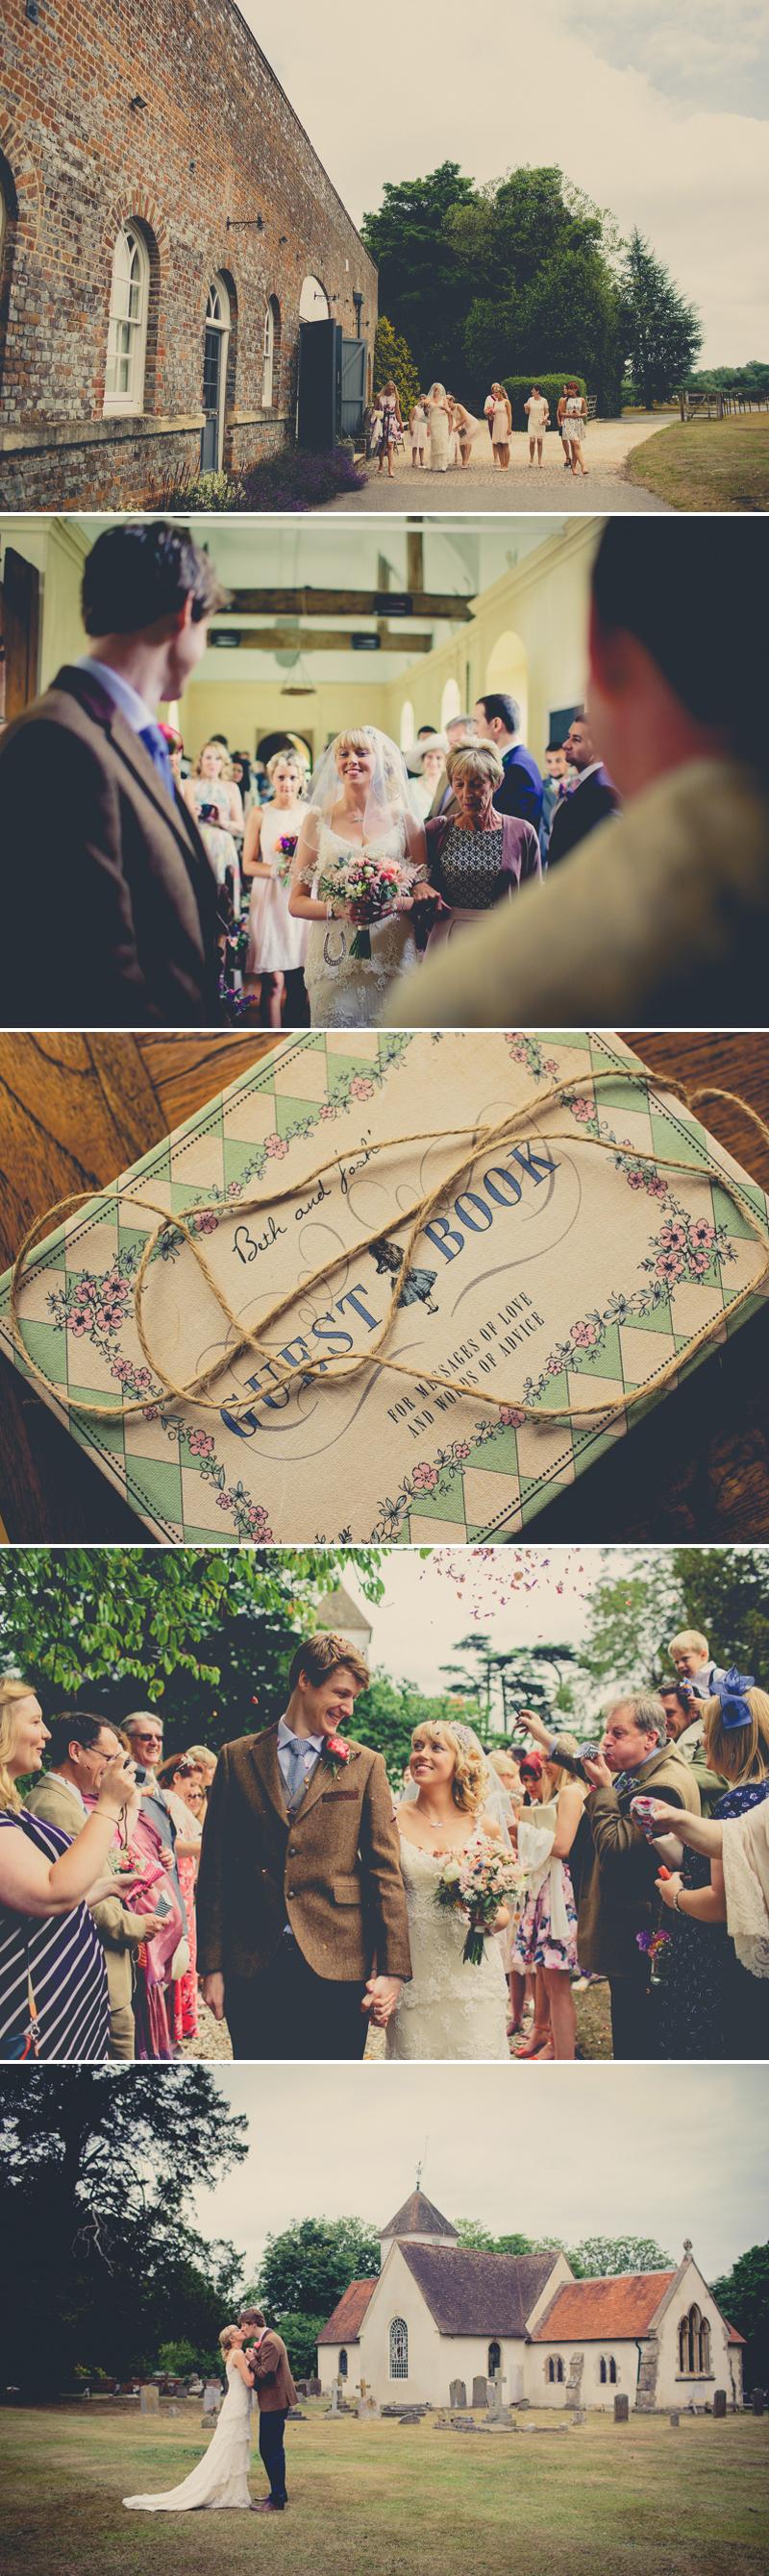 country-chic-diy-wedding-wasing-park-berkshire-003